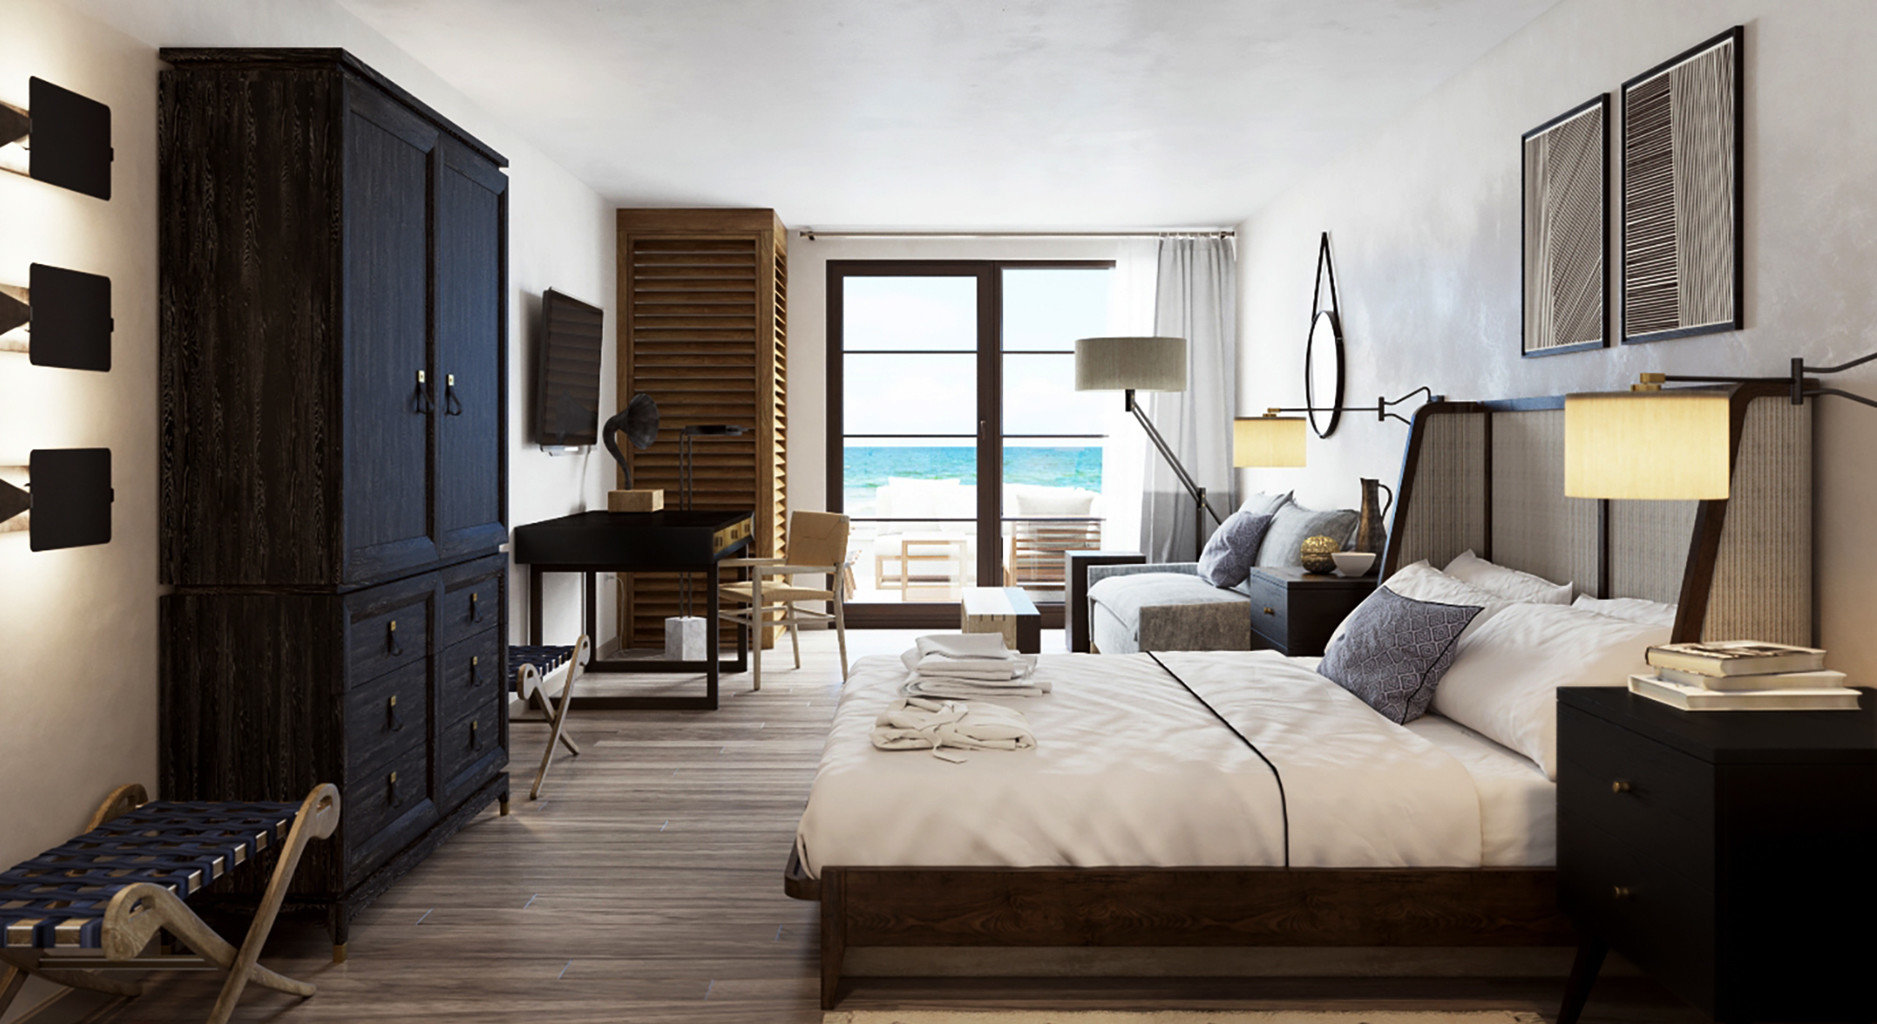 Bedroom Hotels Resort Trip Ideas property living room Suite condominium home cottage Villa